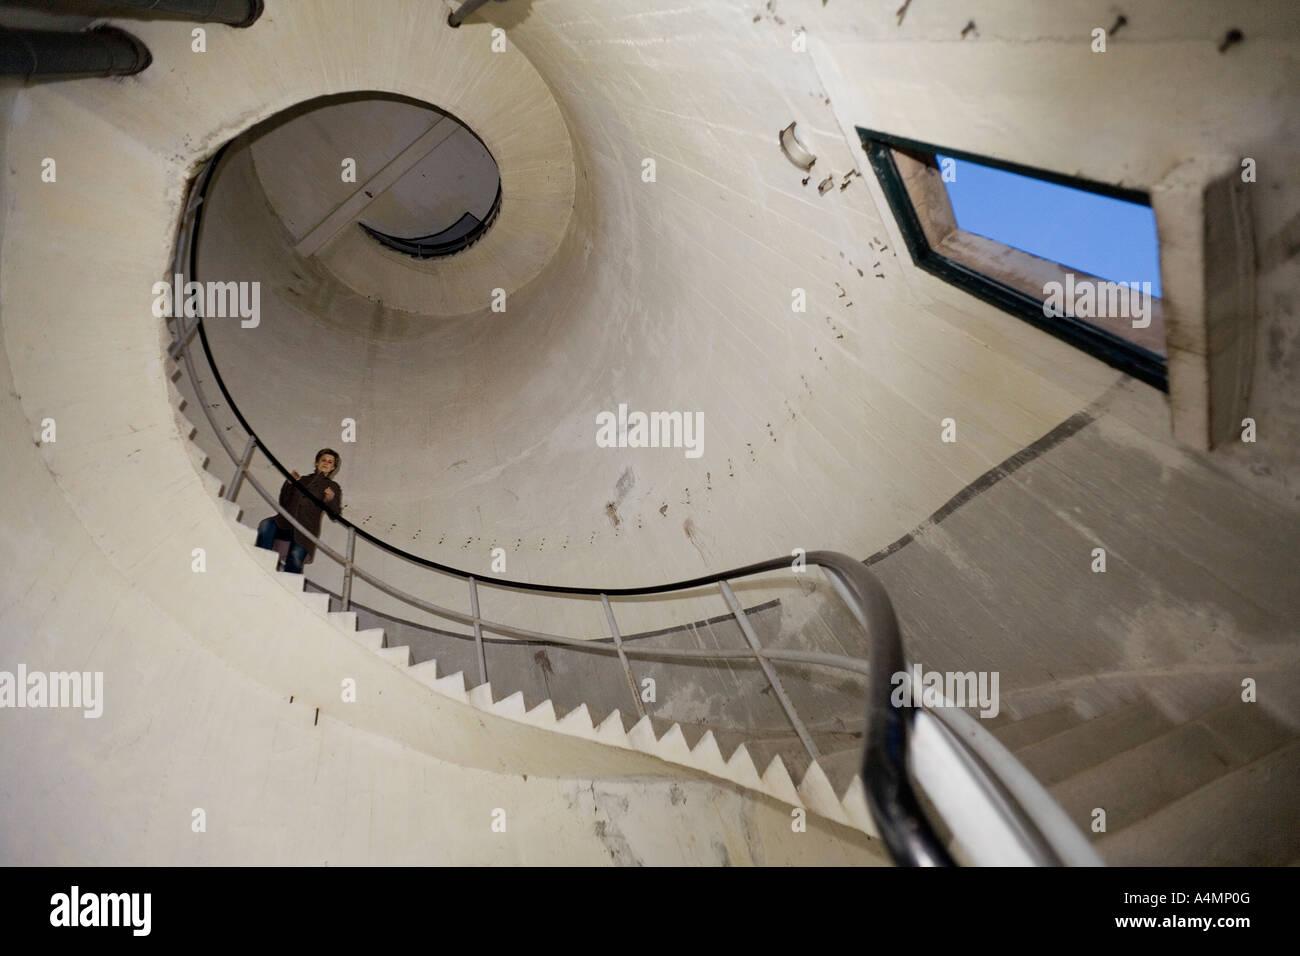 Innere des Wasserturm zeigt eine Wendeltreppe (Frankreich). Escalier de Colimaçon À l' Intérieur Stockbild